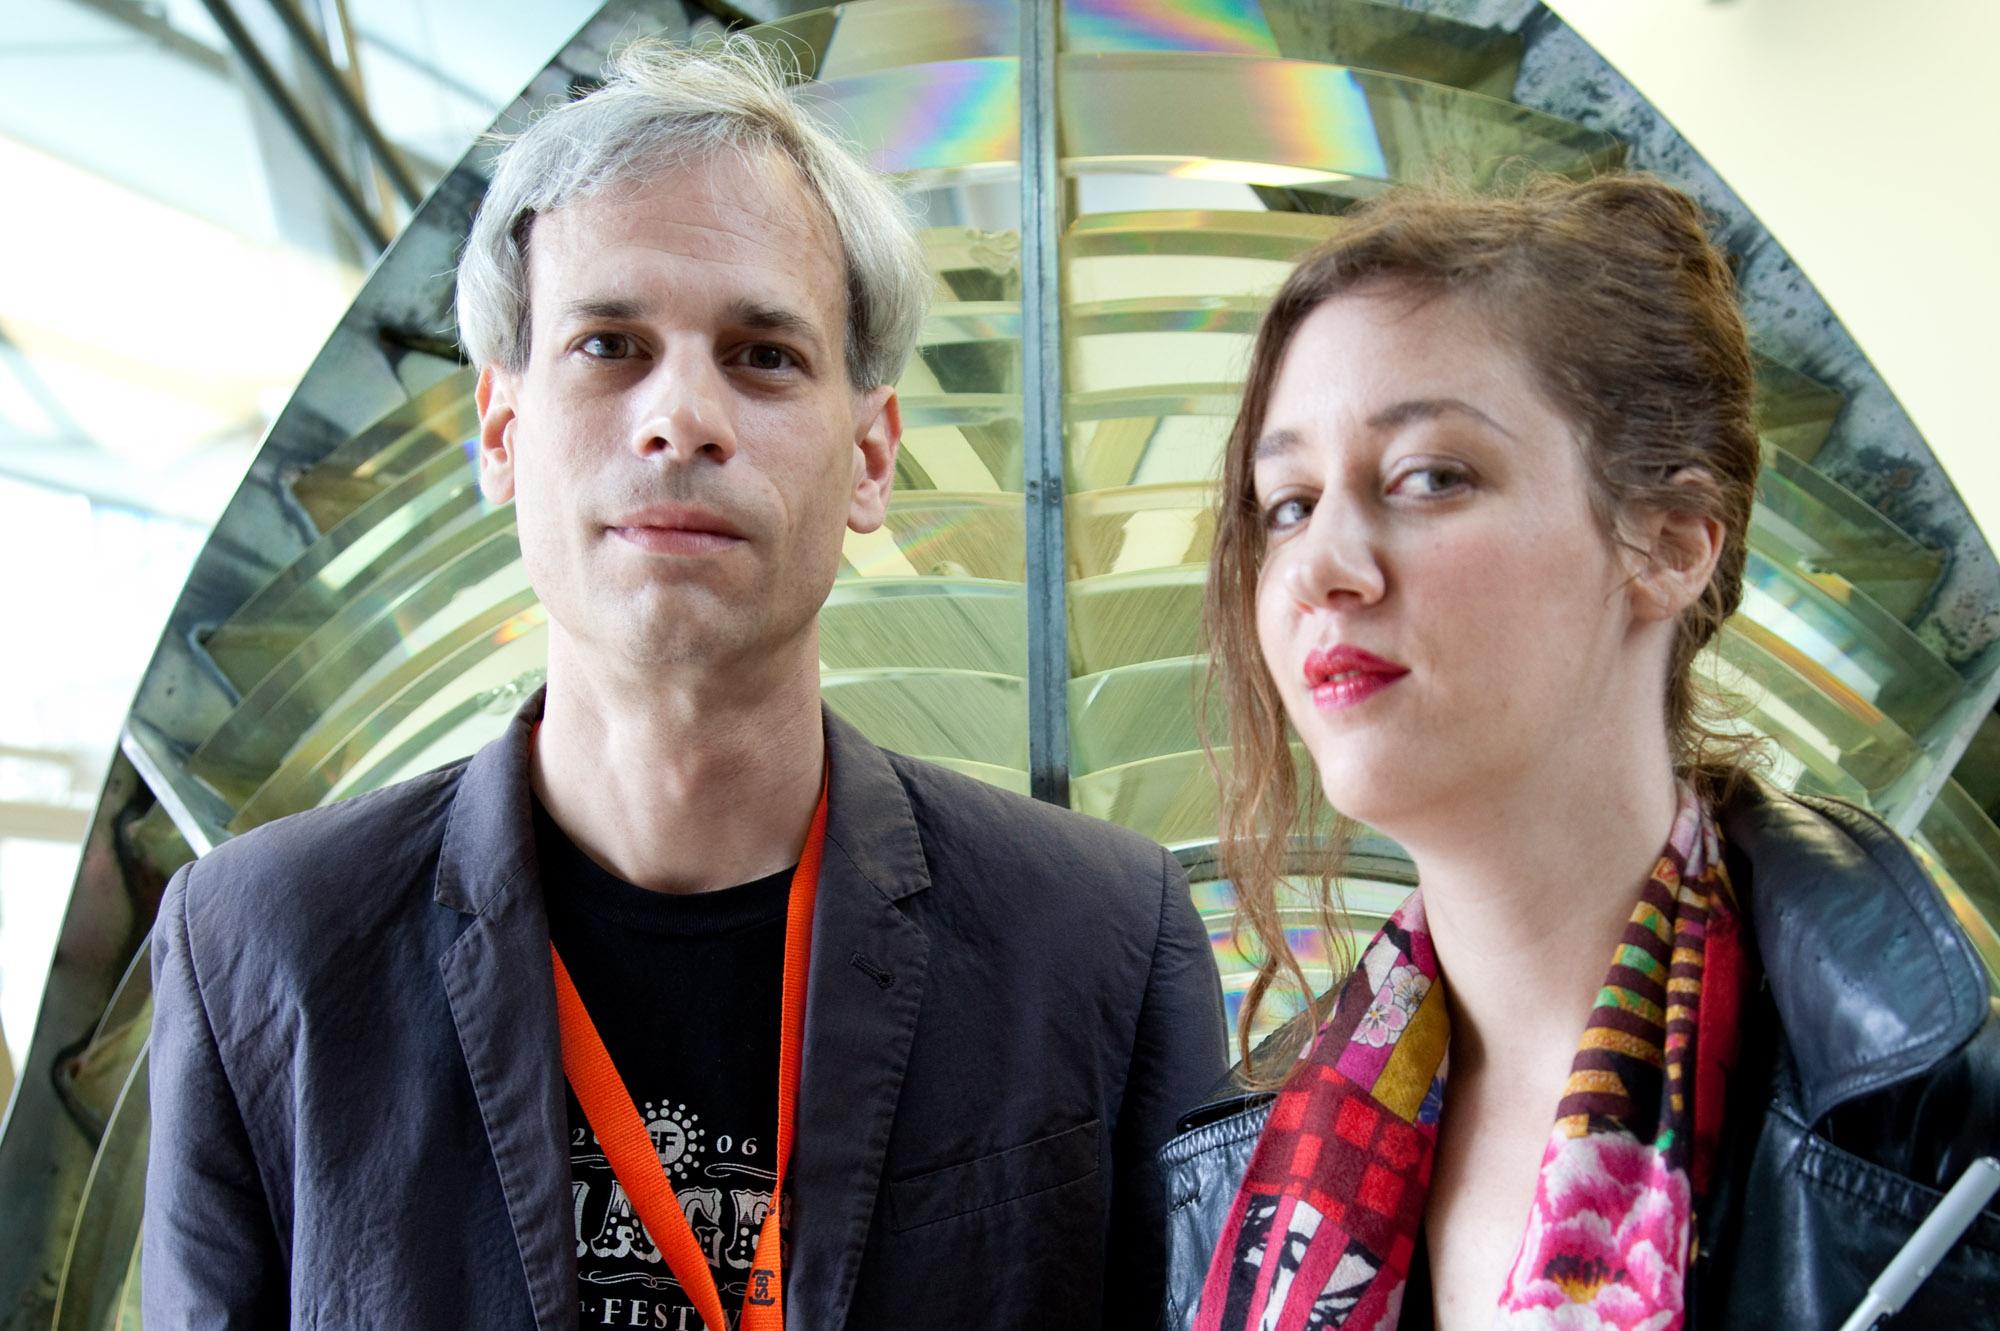 Media City Film Festival. Ética y estética